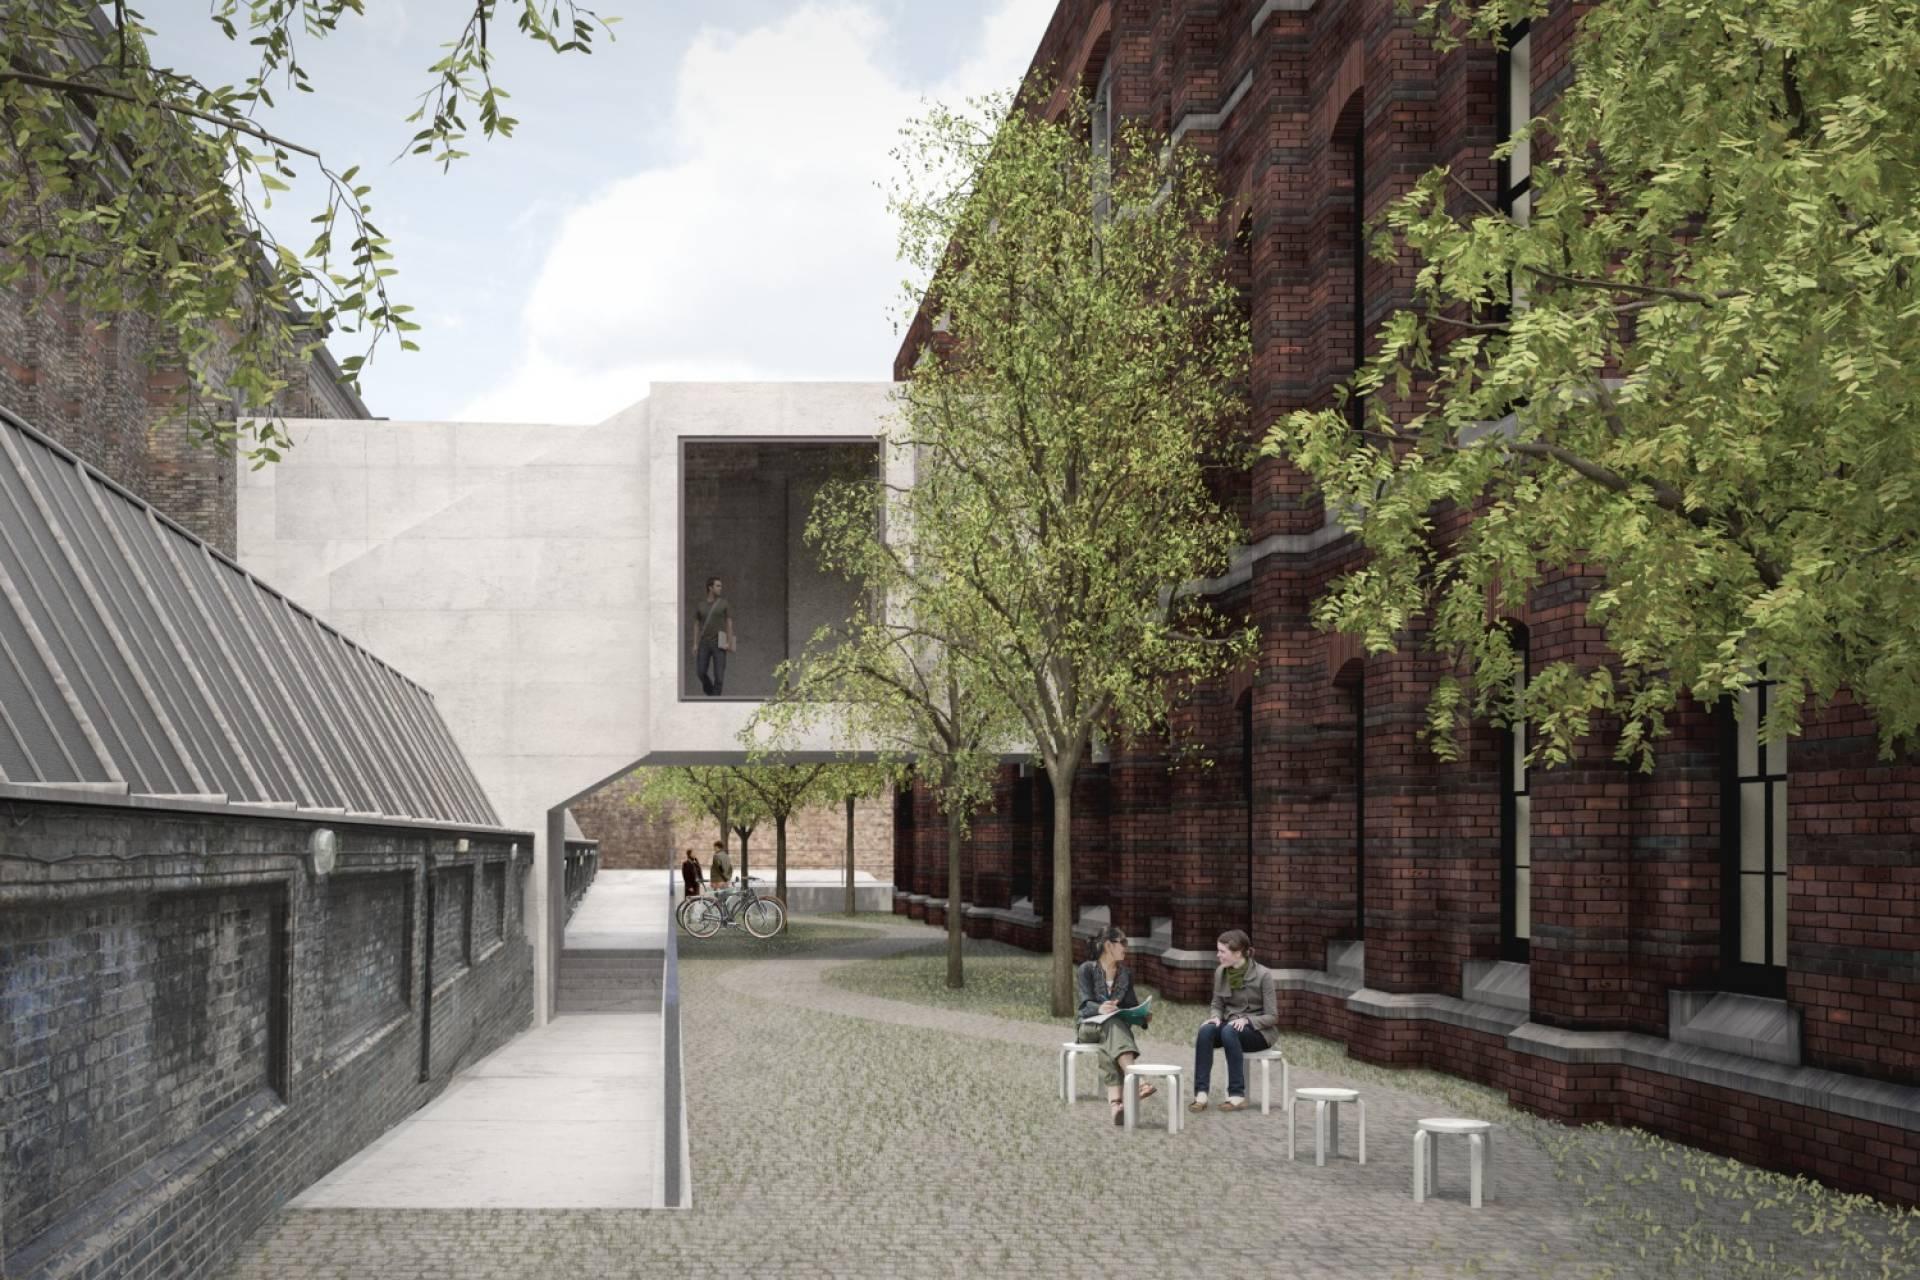 Royal Academy of Arts schools courtyard